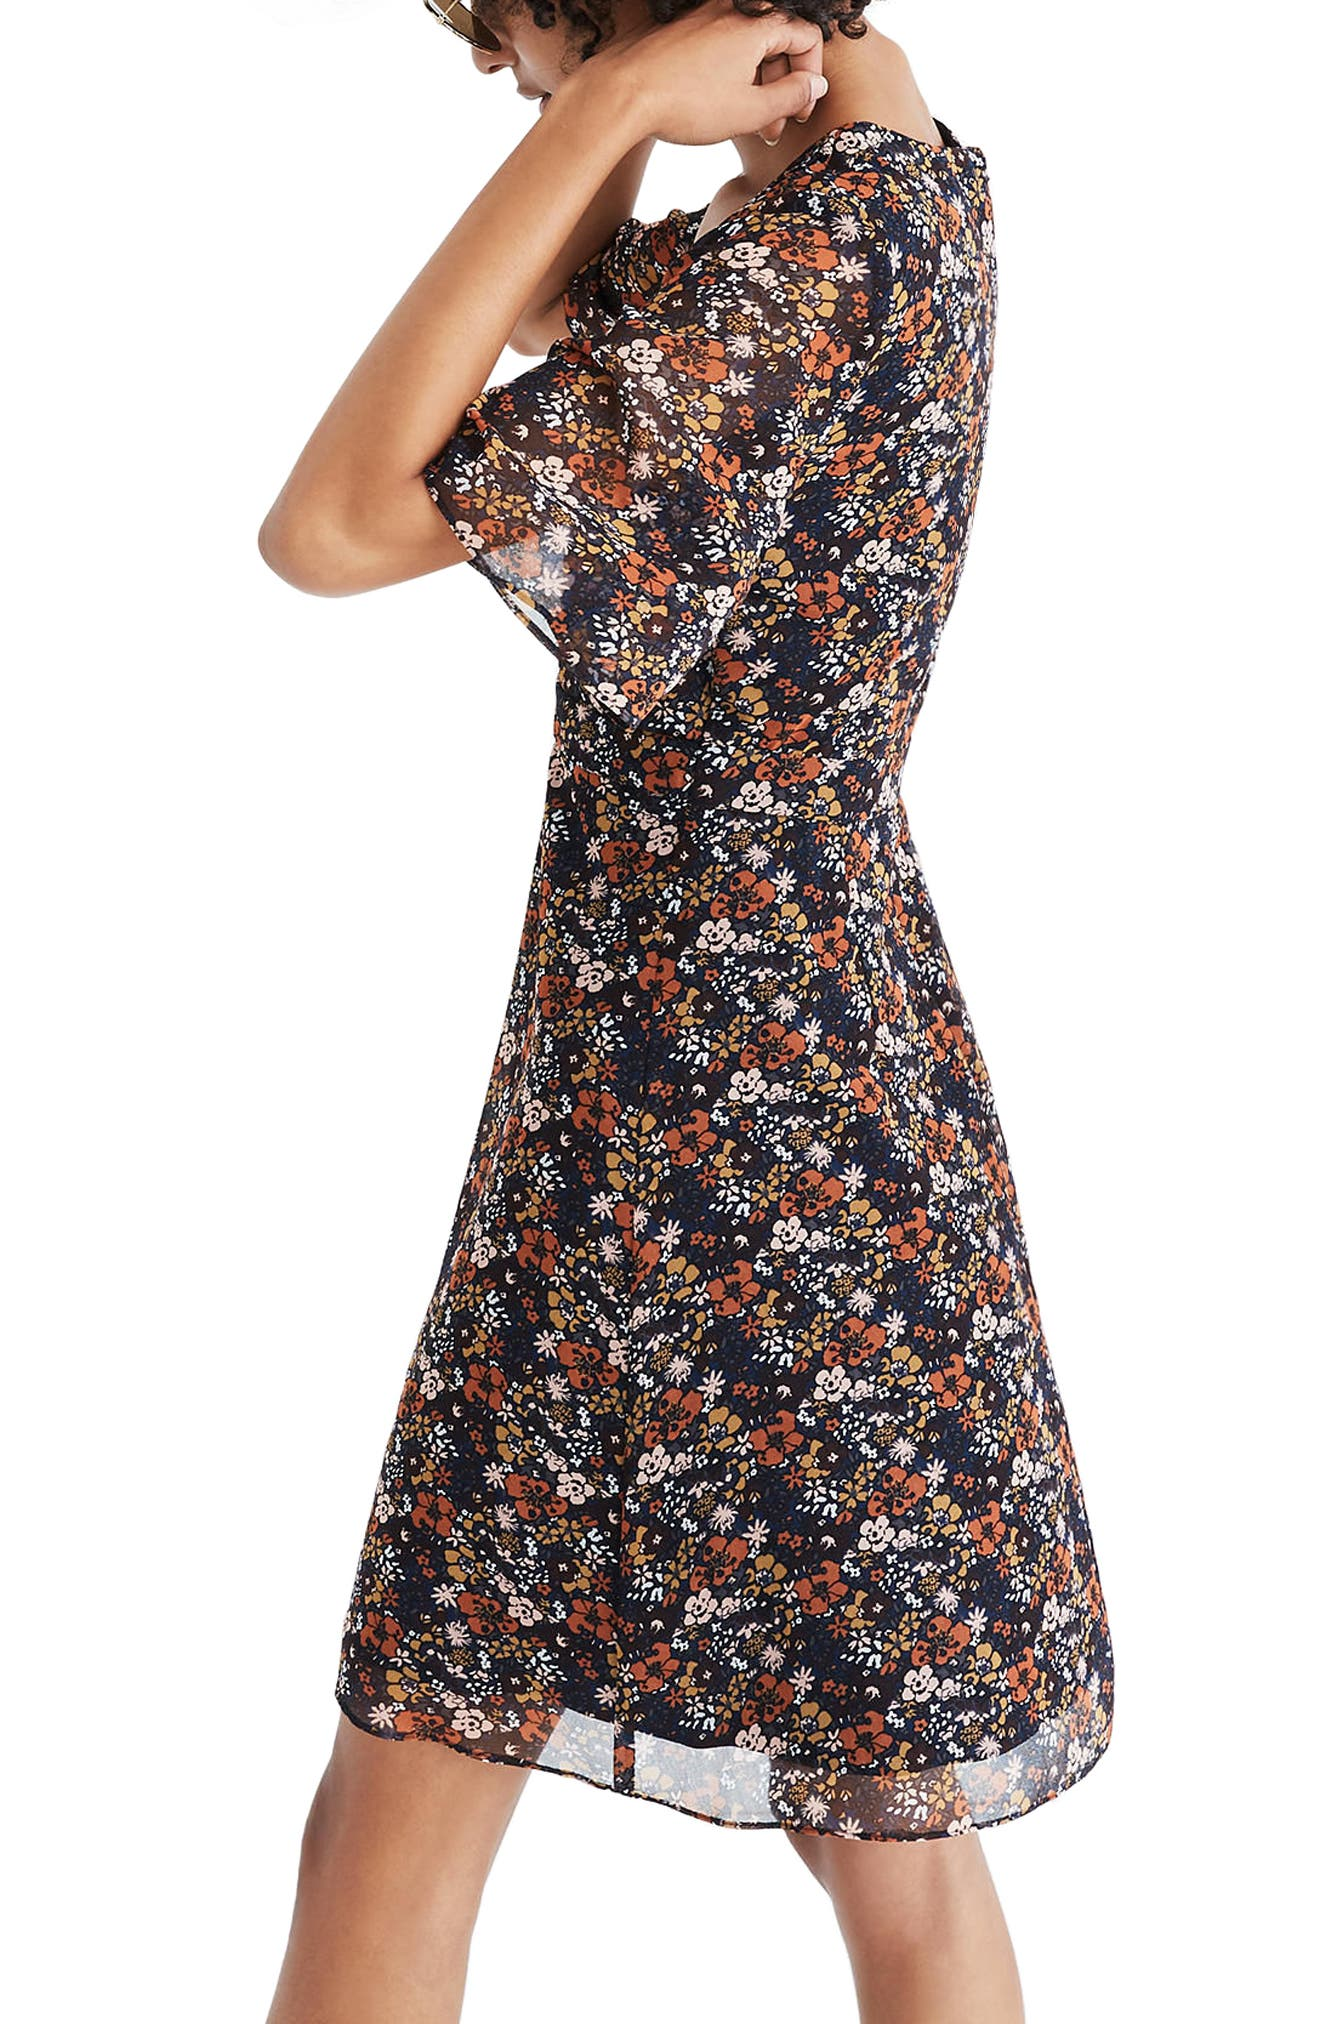 Orchard Flutter Sleeve Dress,                             Alternate thumbnail 2, color,                             200